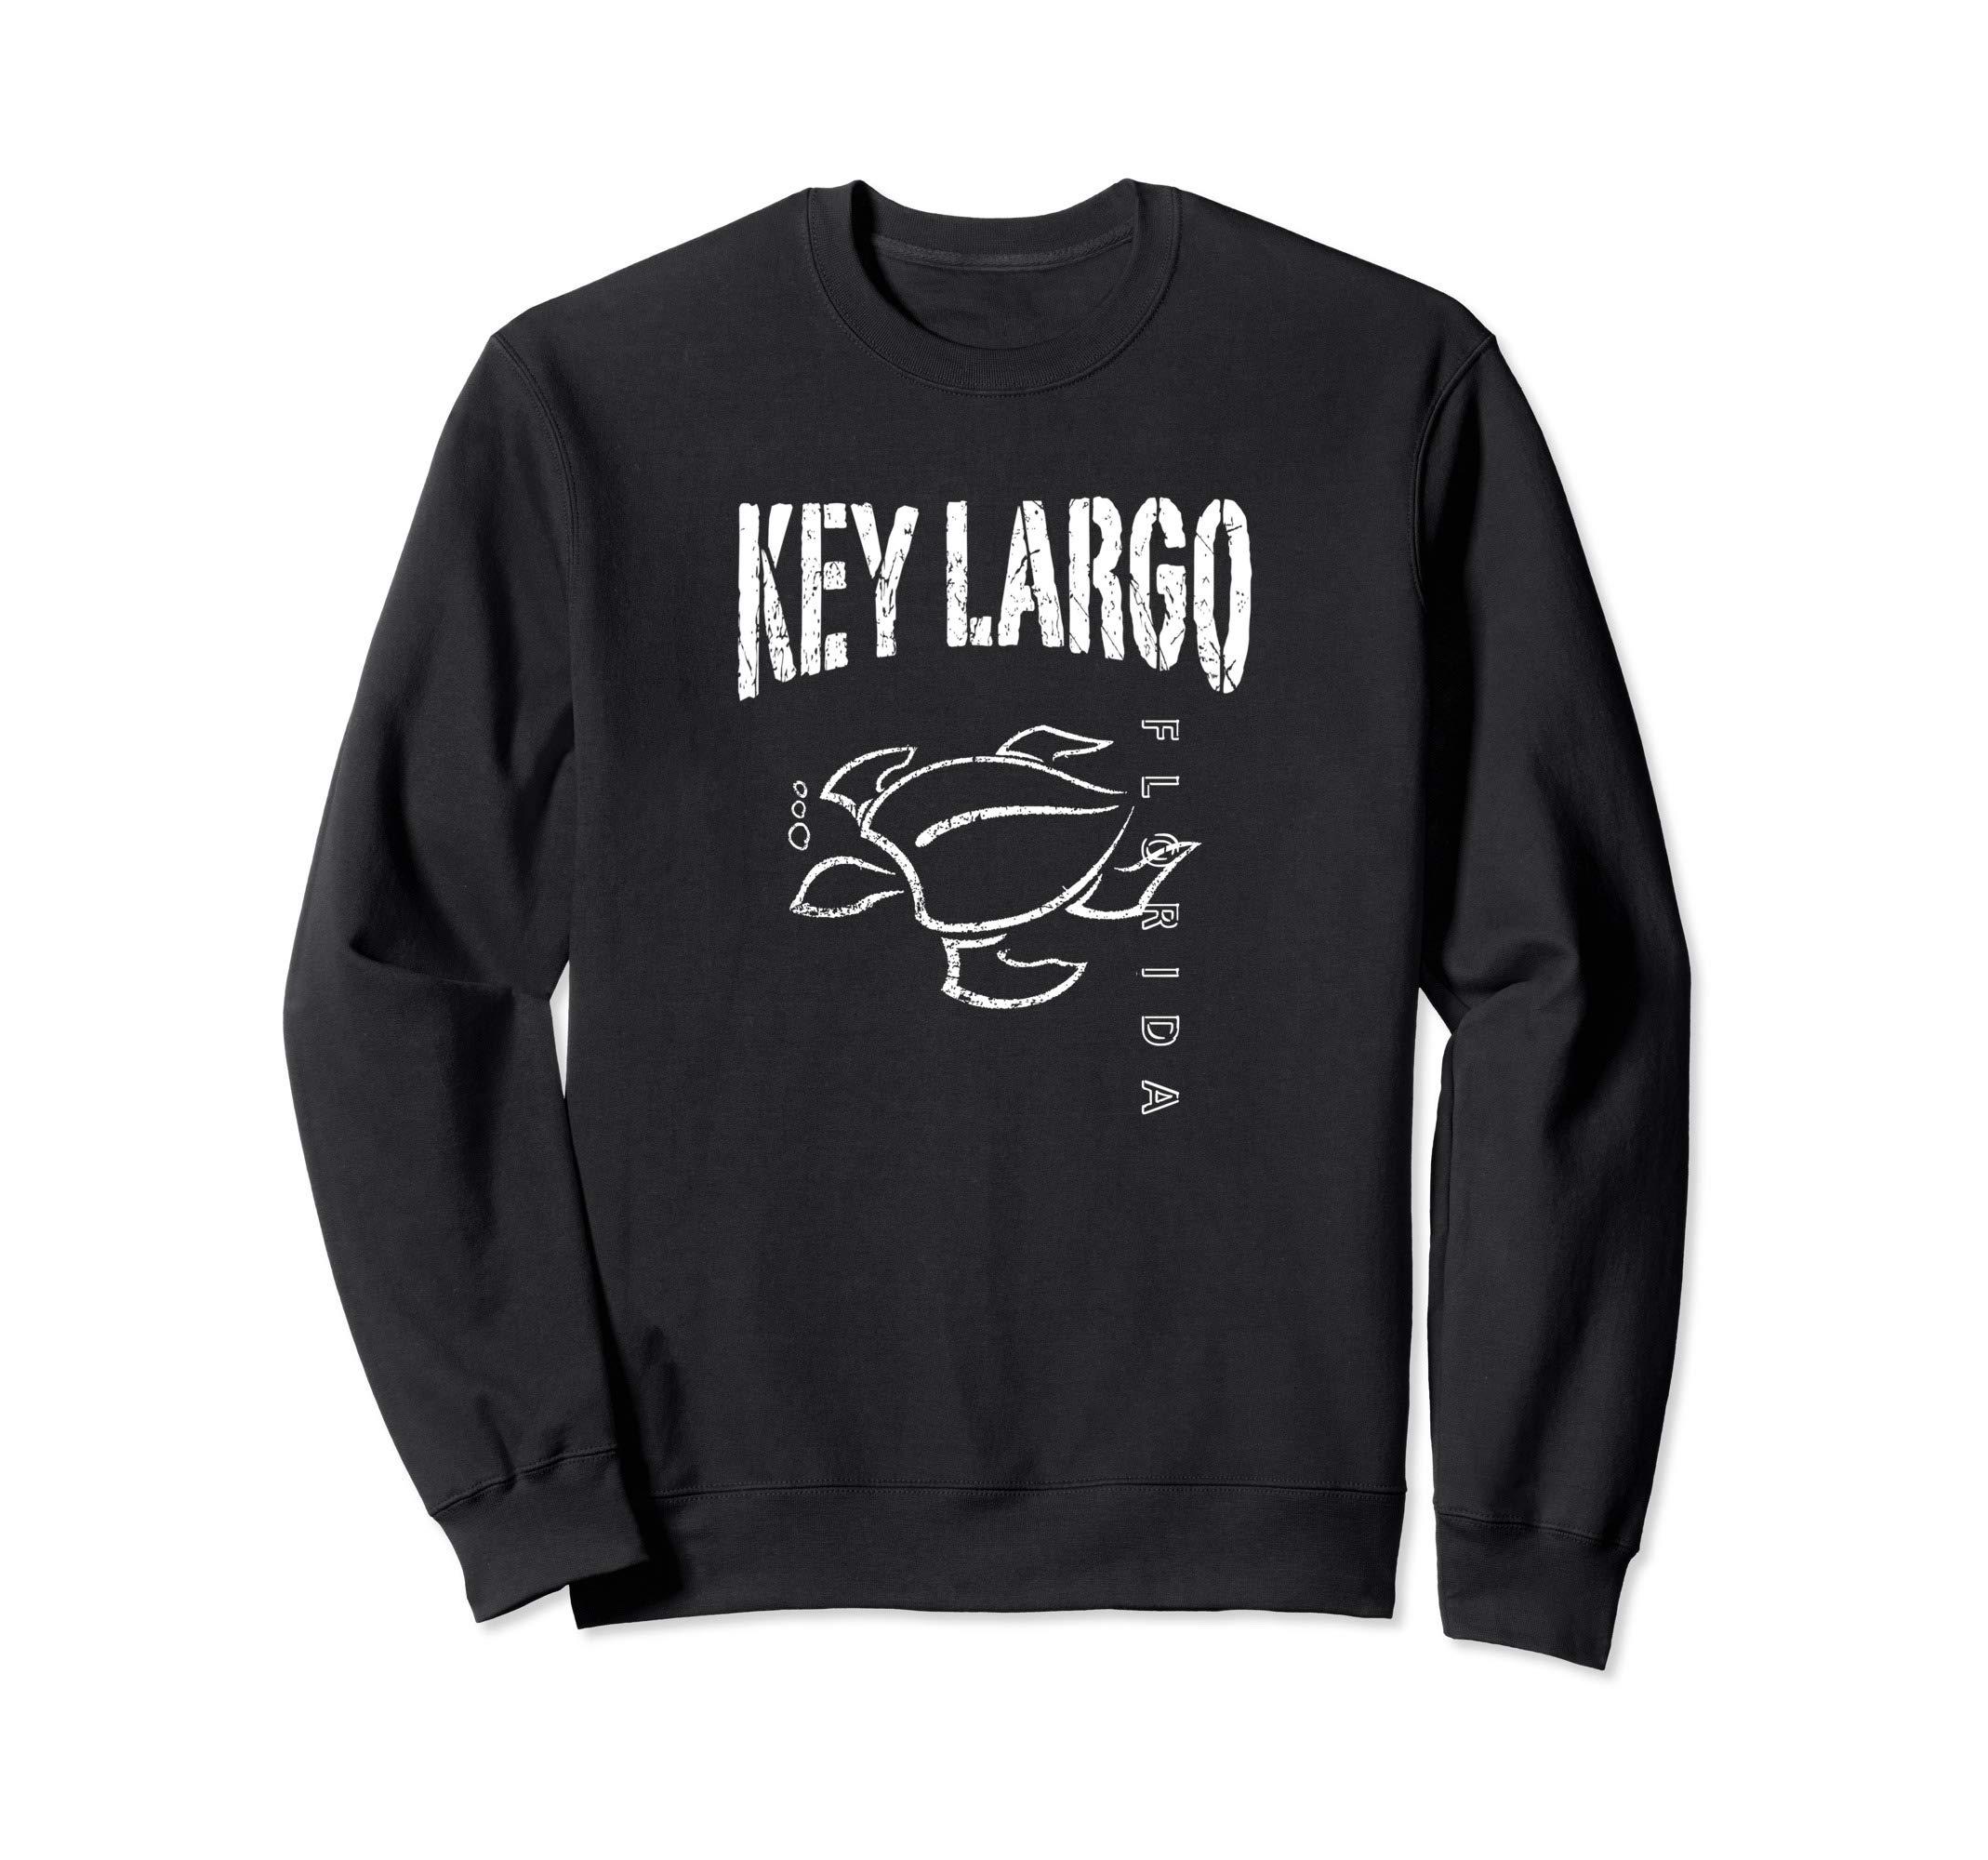 Key Largo Florida Souvenir Vacation Gift Sea Turtle Sweatshirt by KEY LARGO Souvenir Gift Florida Sailing FL